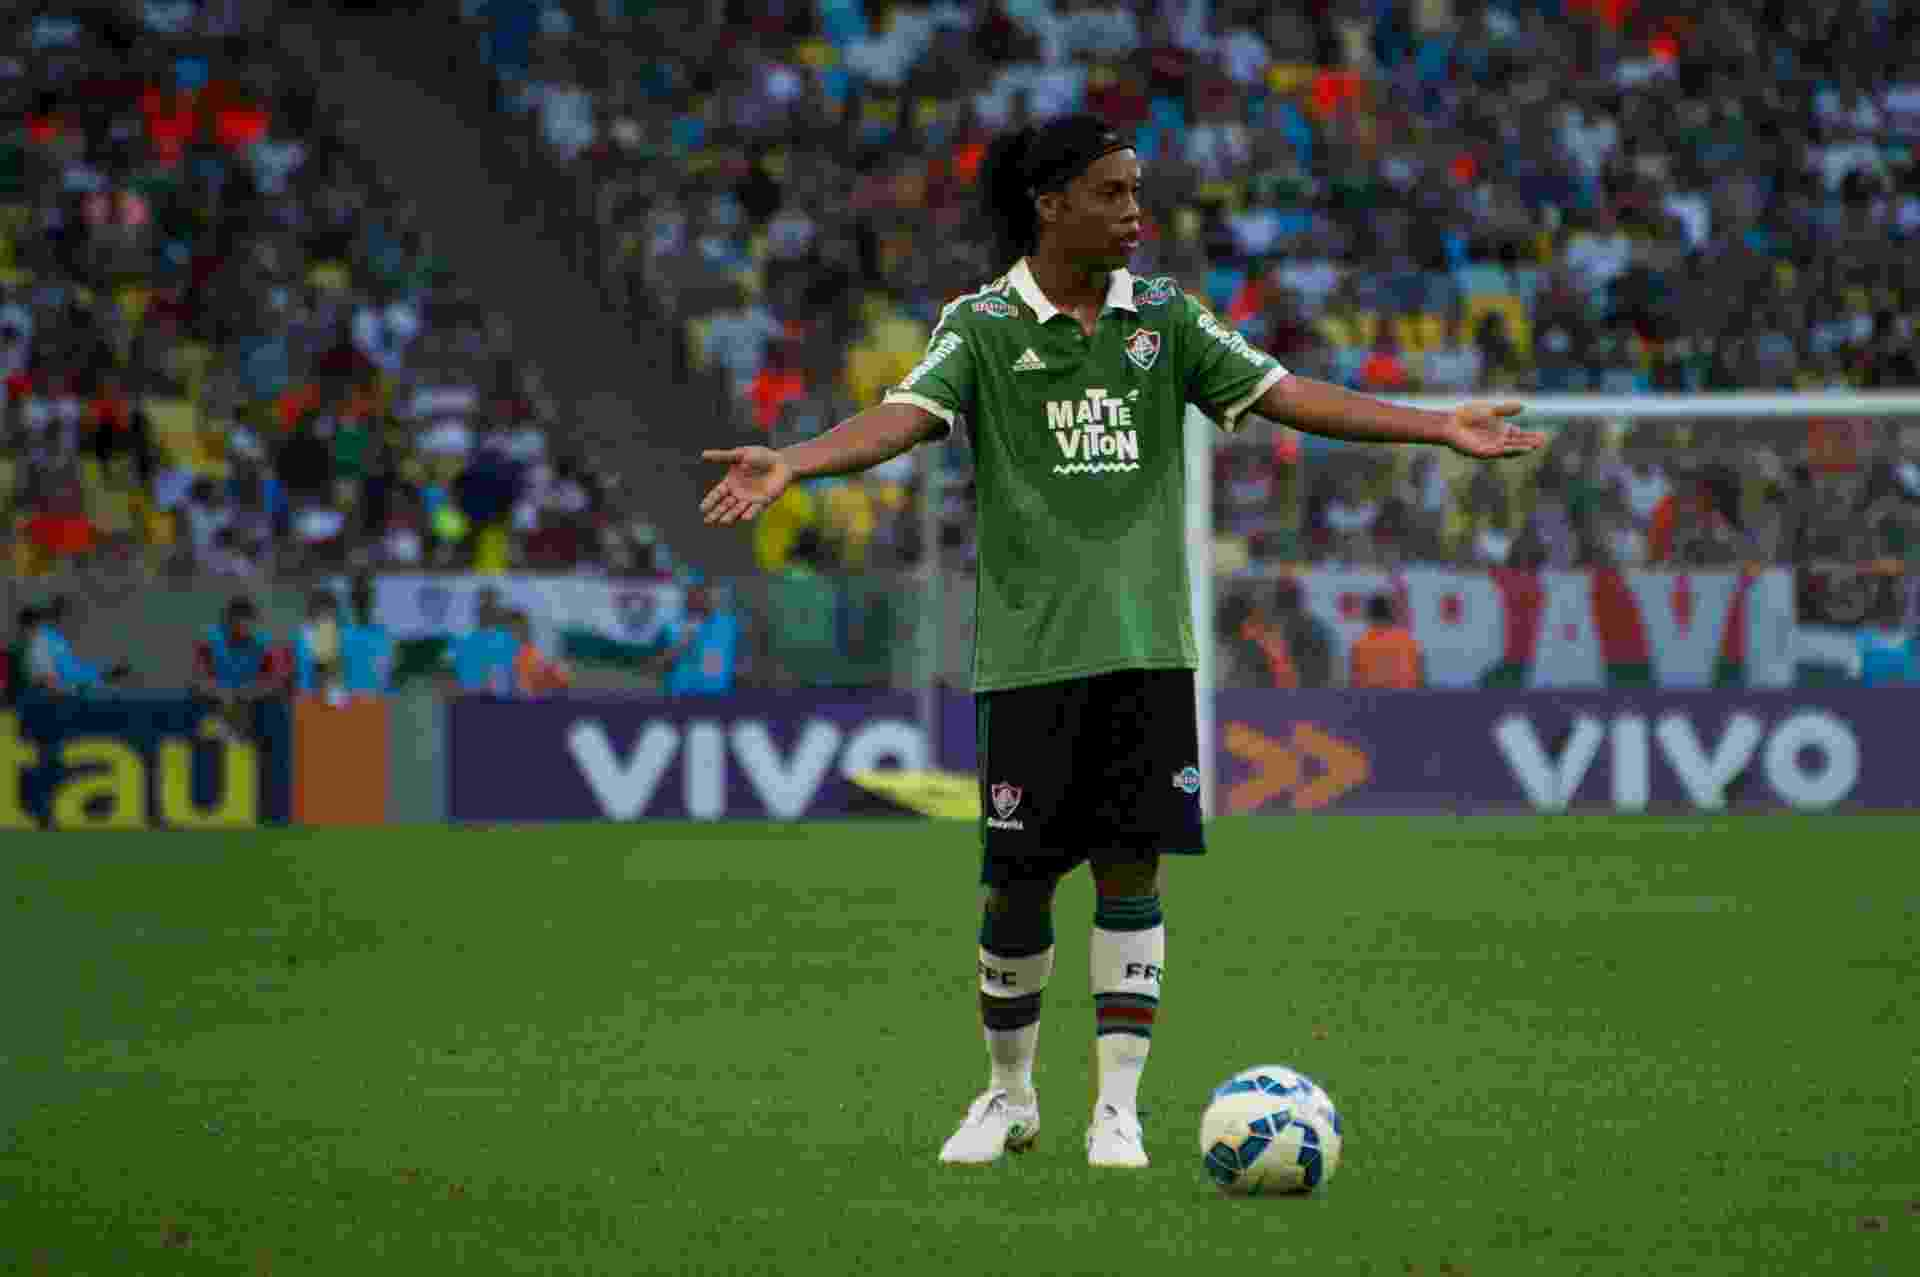 Ronaldinho Gaúcho gesticula durante confronto entre Fluminense e Atlético-MG - Bruno Haddad/Fluminense FC